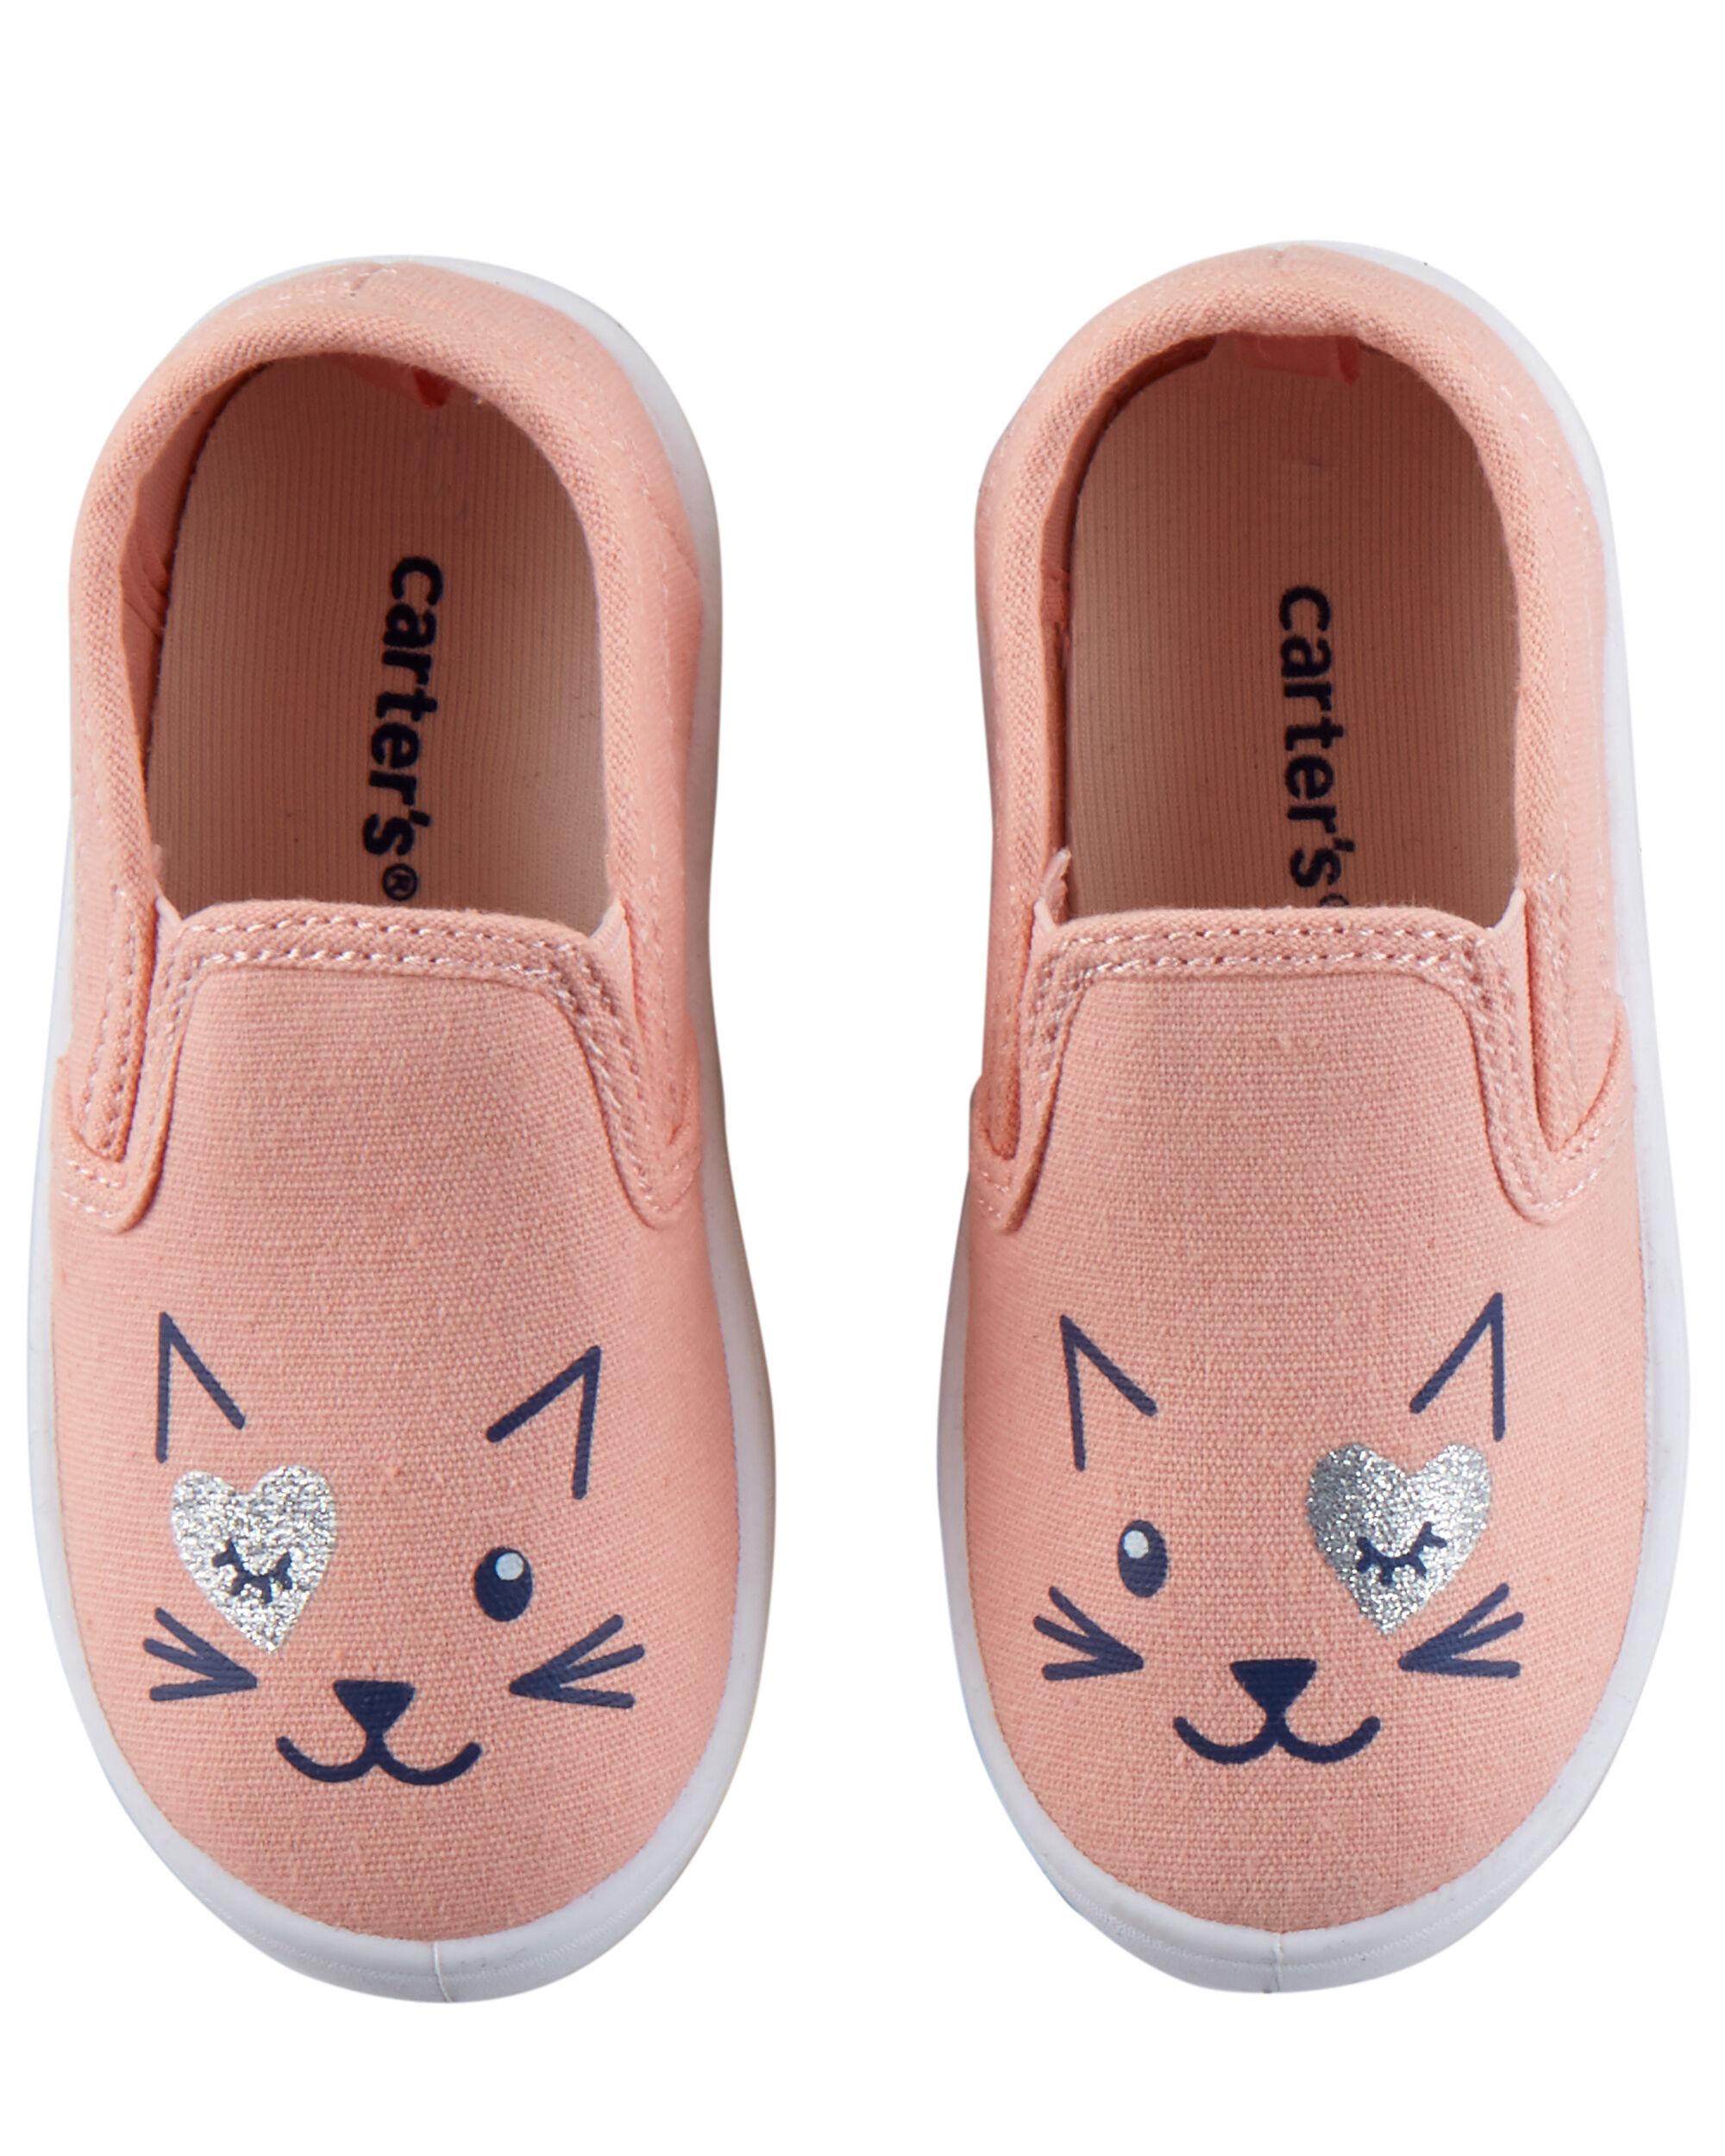 Cat Casual Sneakers   carters.com